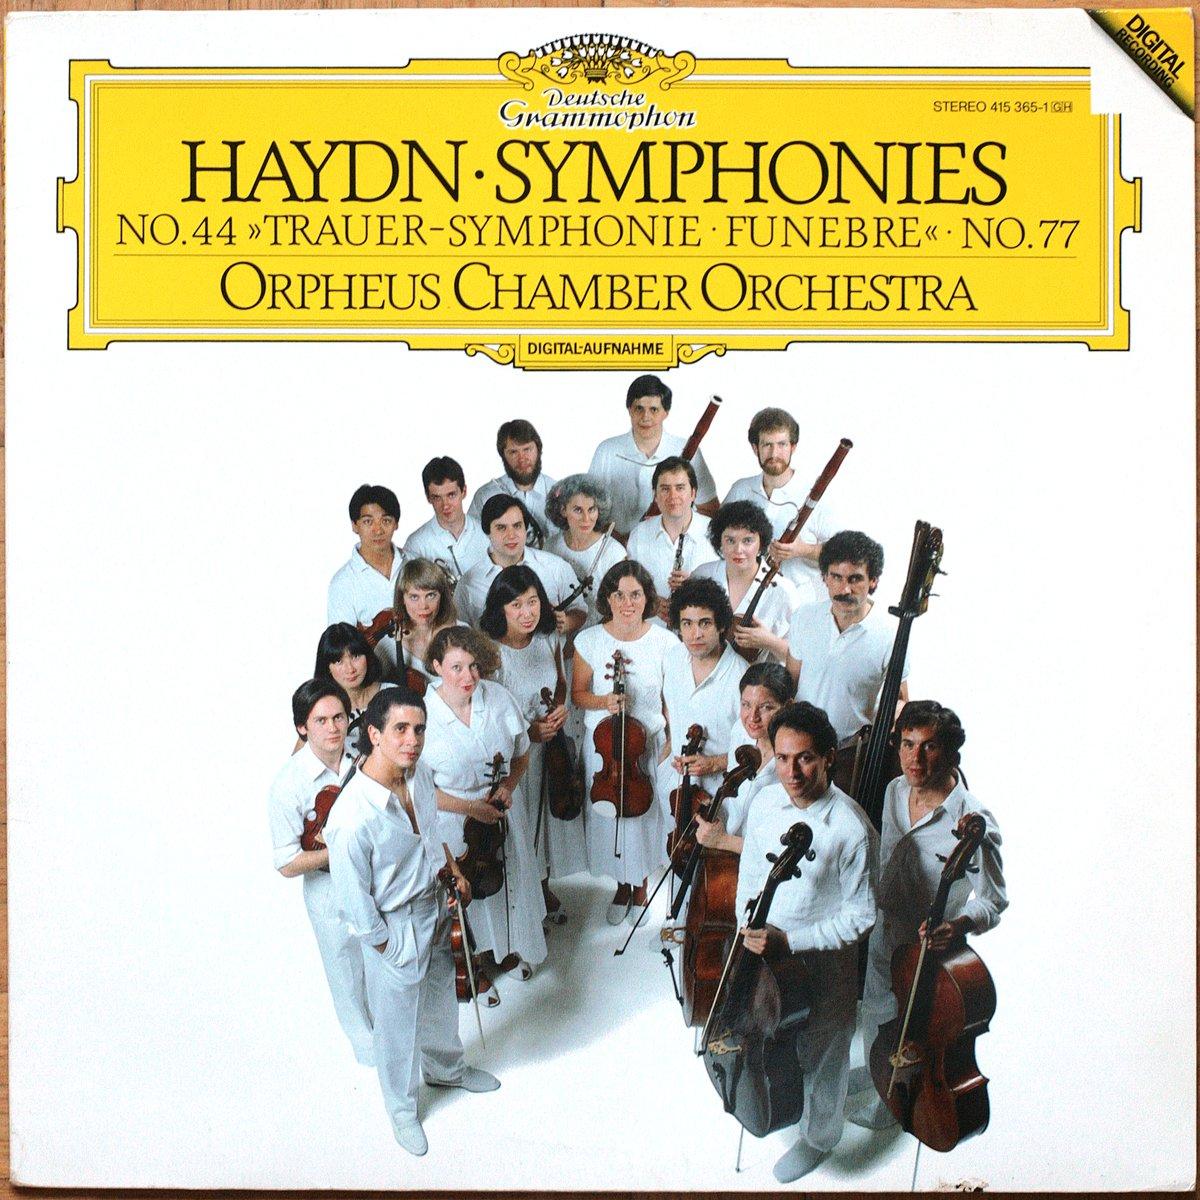 DGG 415 365 Haydn Symphonies 44 77 Orpheus Chamber Orchestra DGG Digital Aufnahme